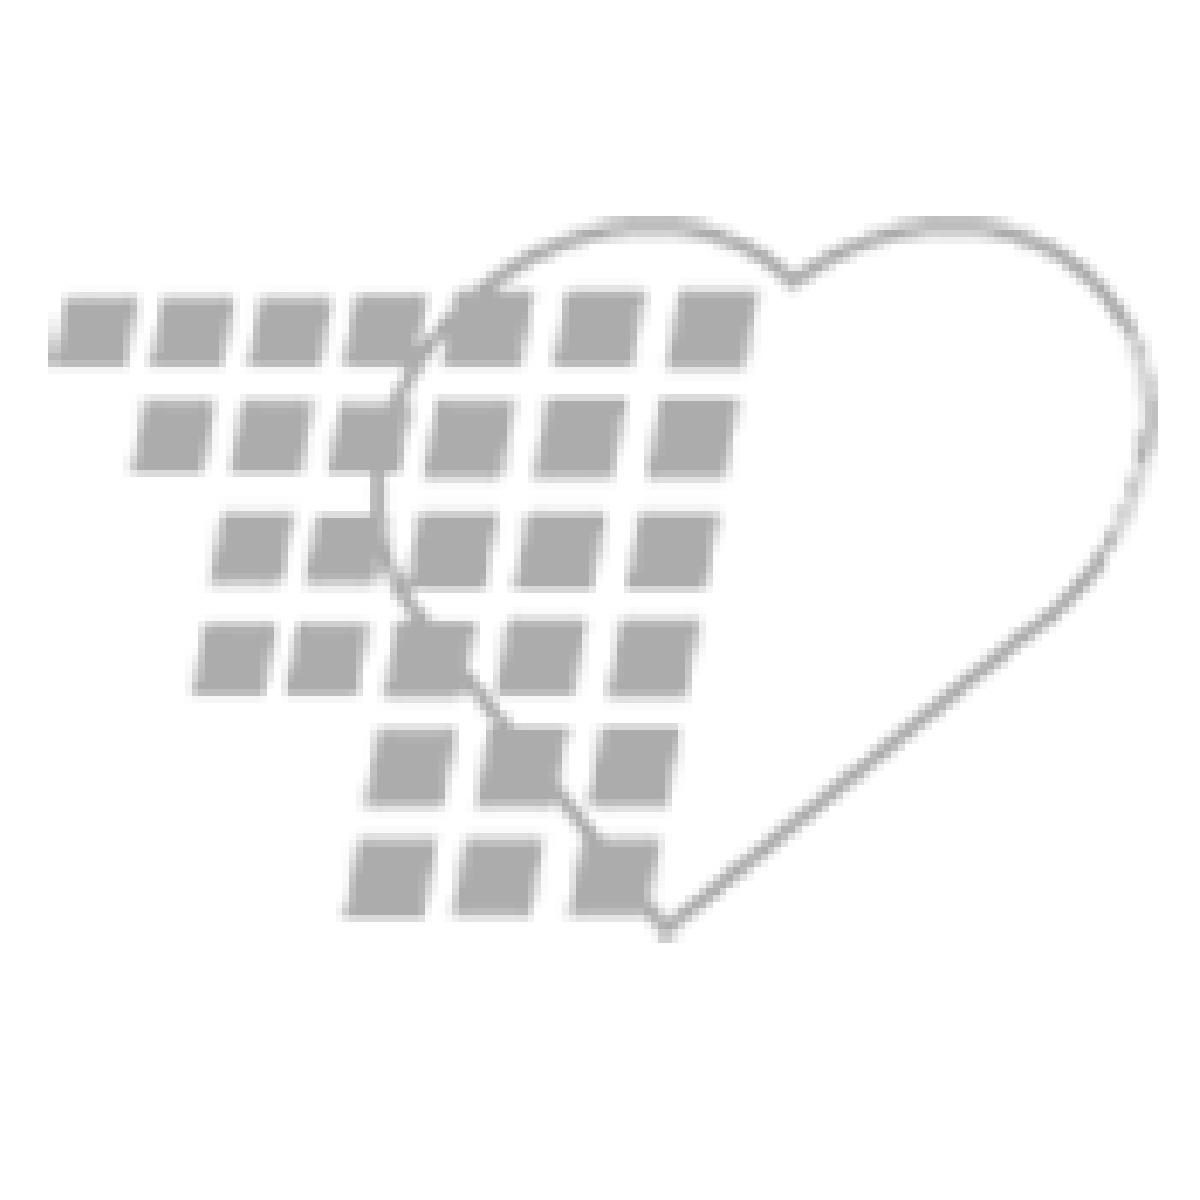 06-93-0060 - Demo Dose® (ASA) Aspirn 325 mg - 100 Pills/Box